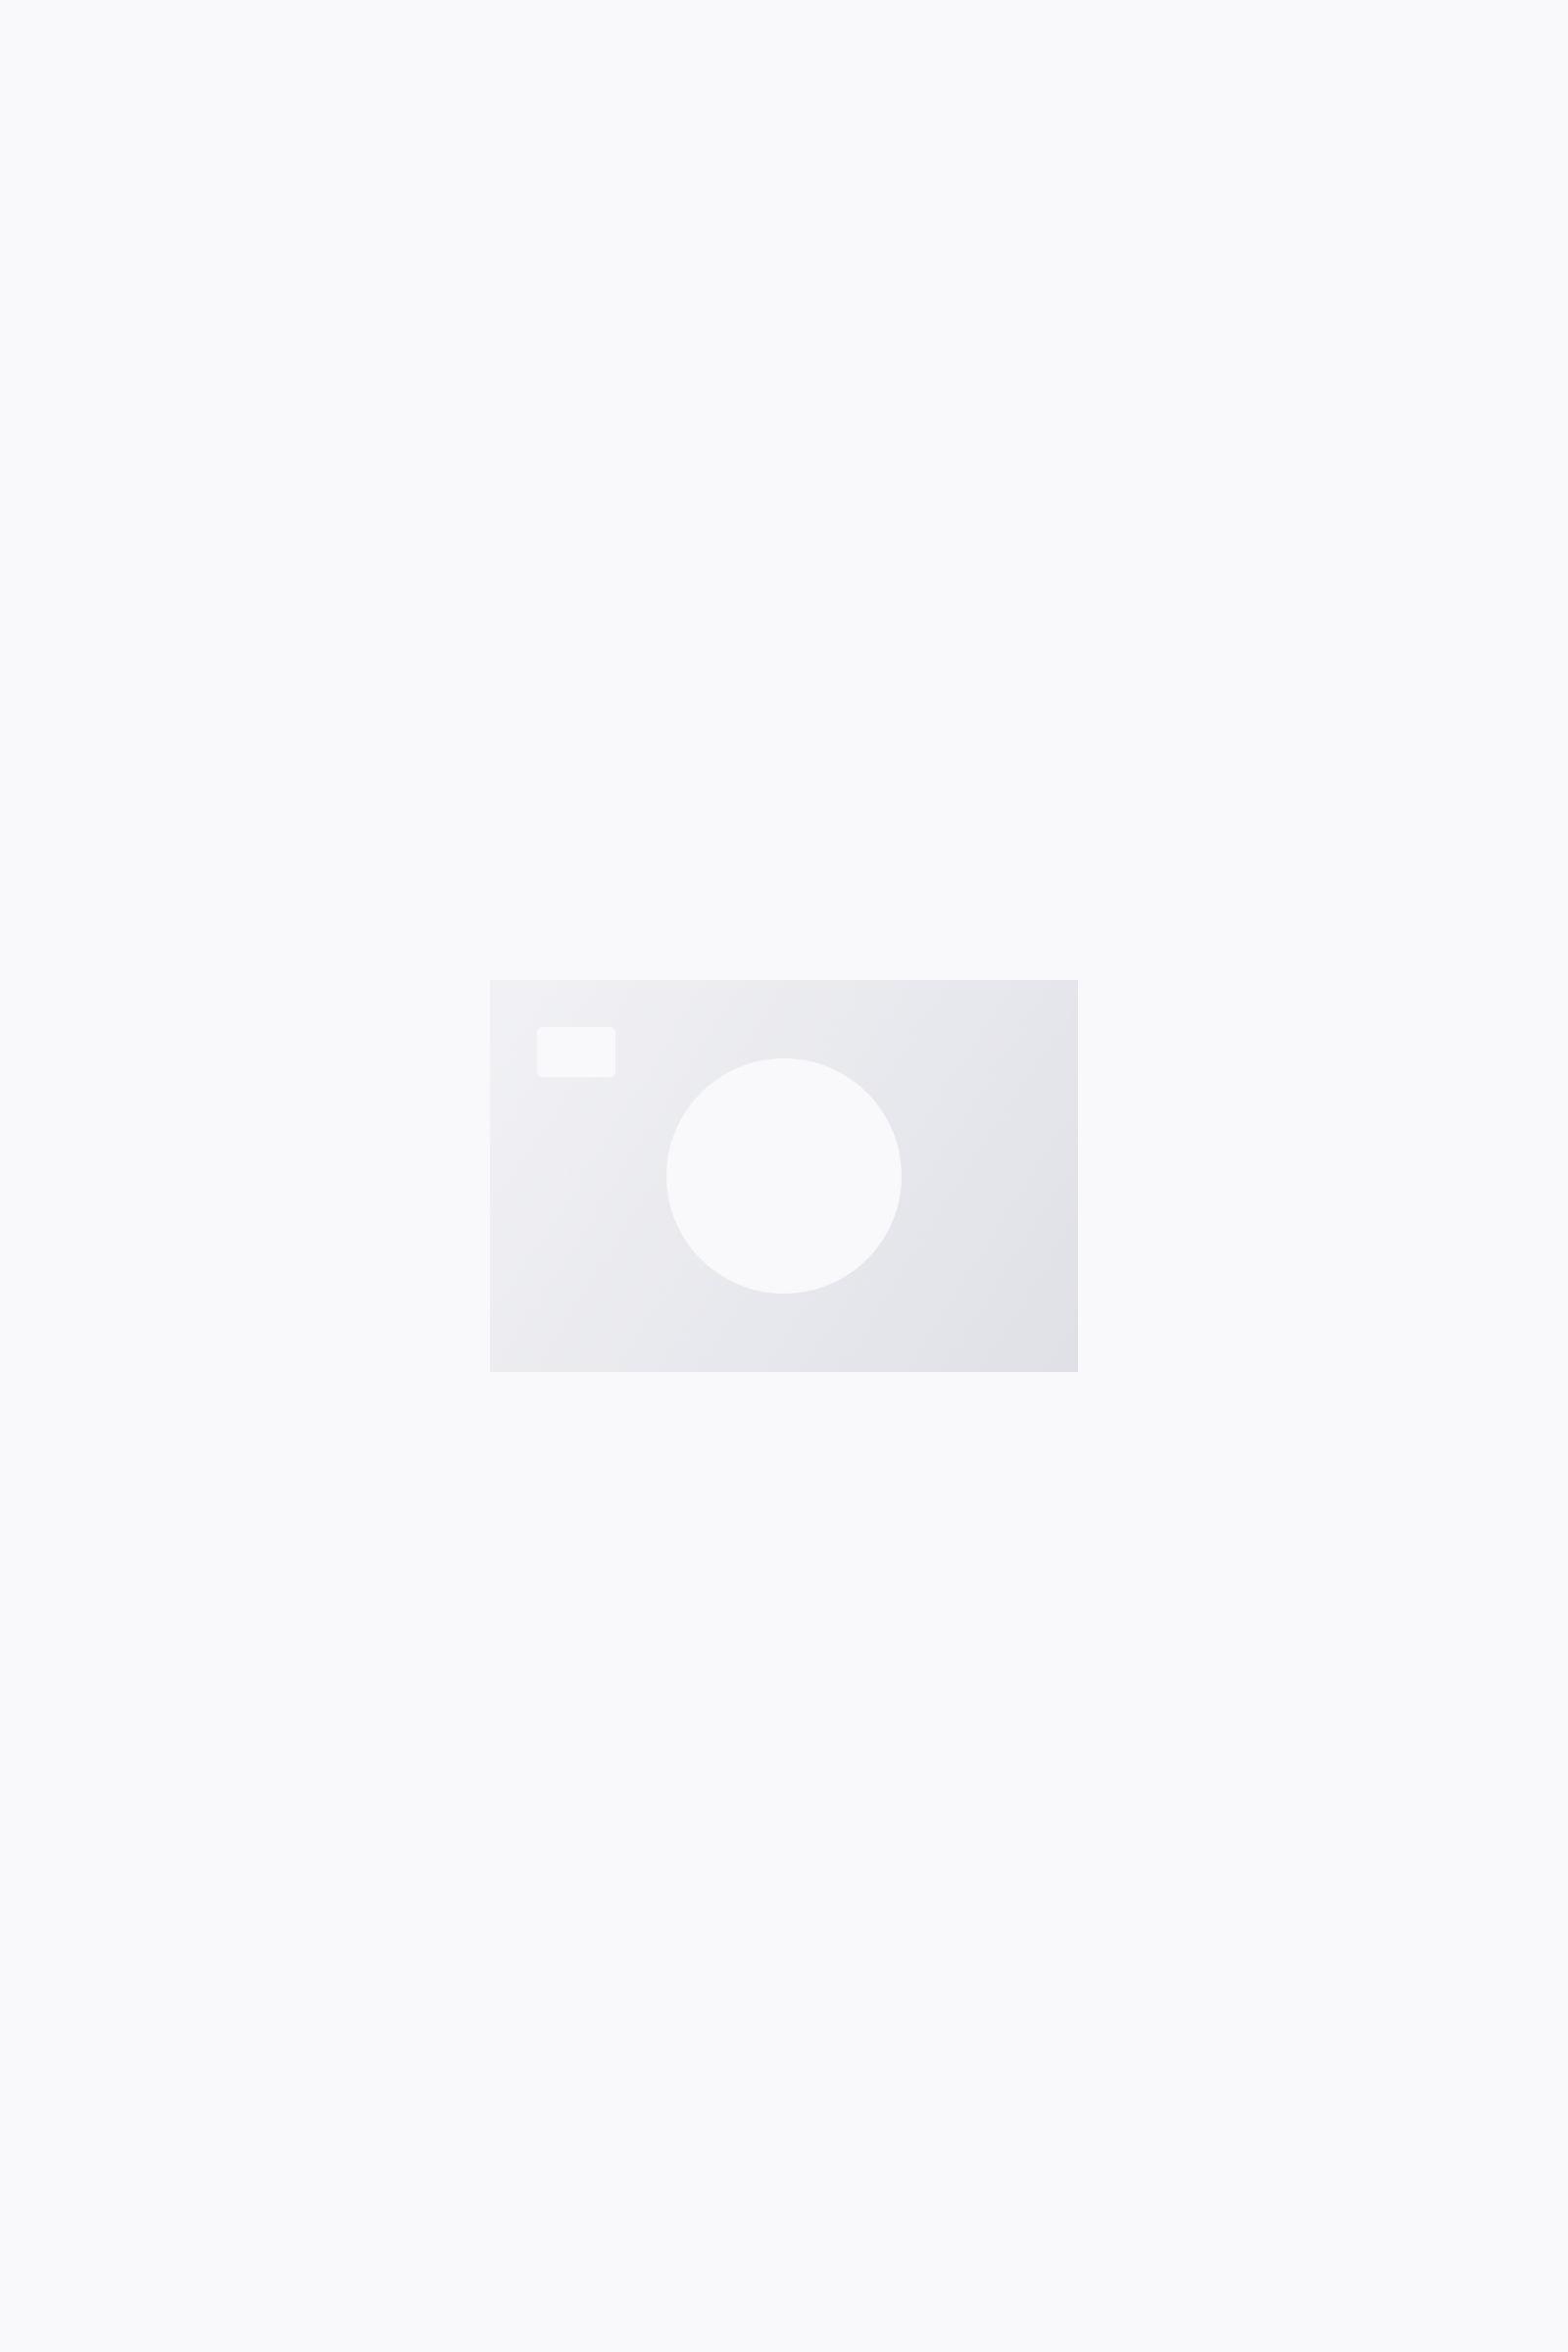 COS SWEAT T-SHIRT,black